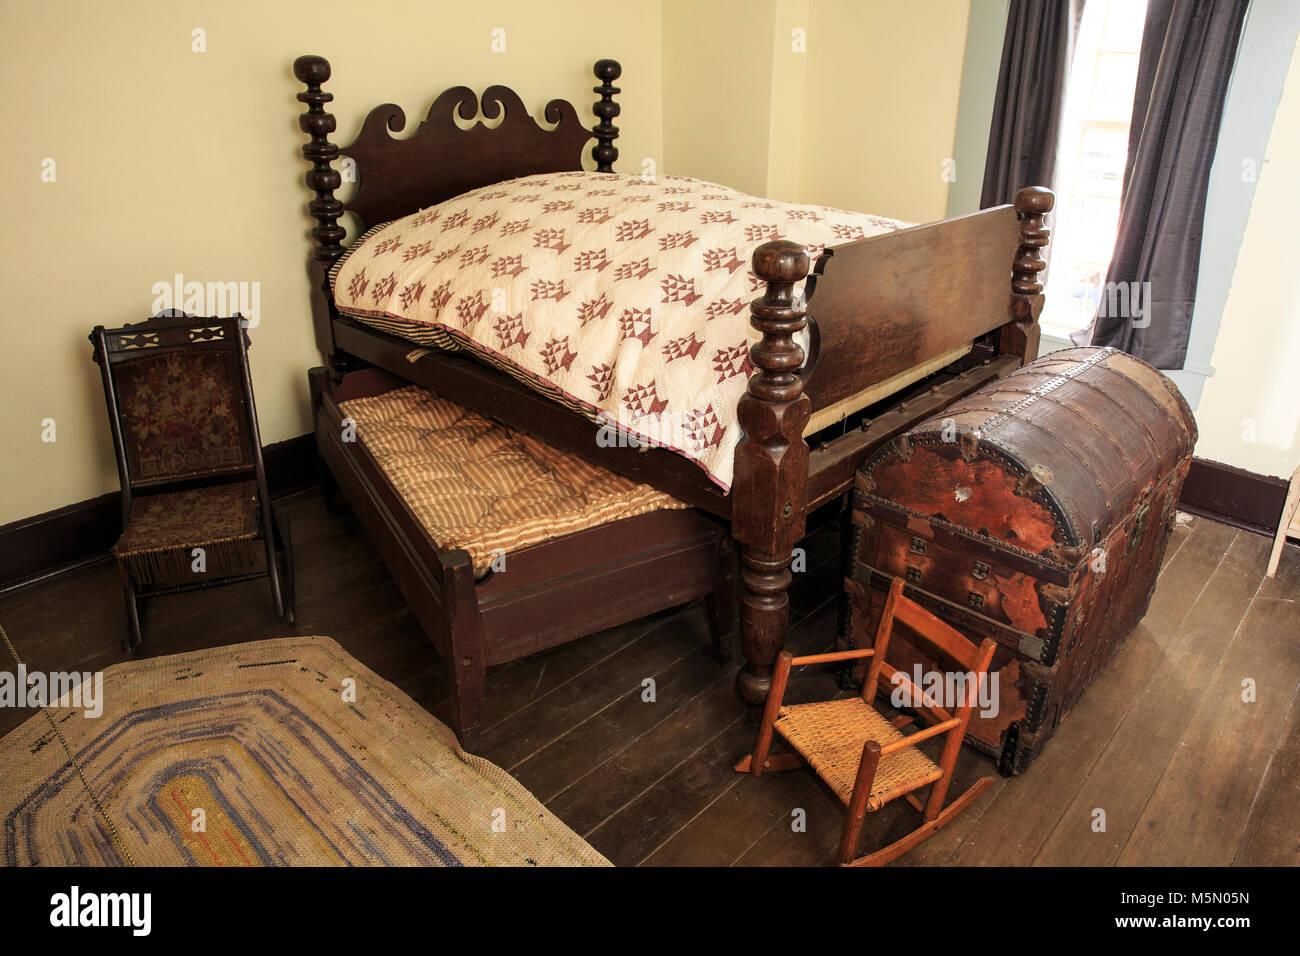 https www alamyimages fr photo image 19 eme siecle lit dans un musee hueston woods state park 175638113 html